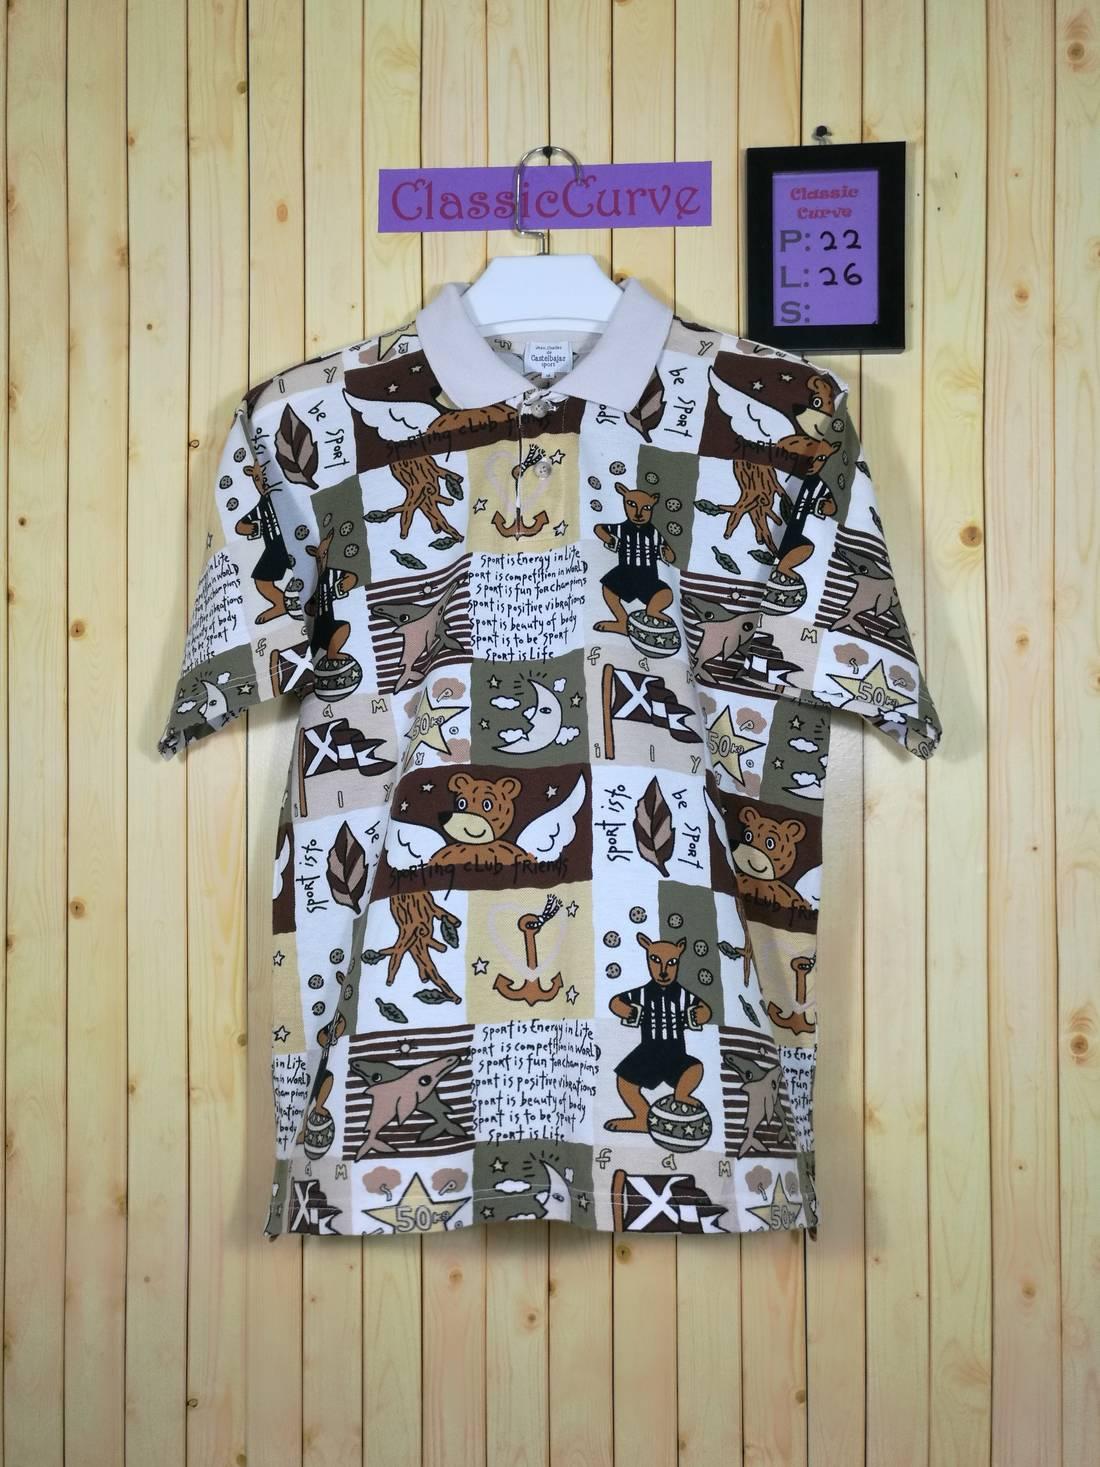 SALE!! Jc De CastelBajac Fullprint Tshirt Nice Design Size S